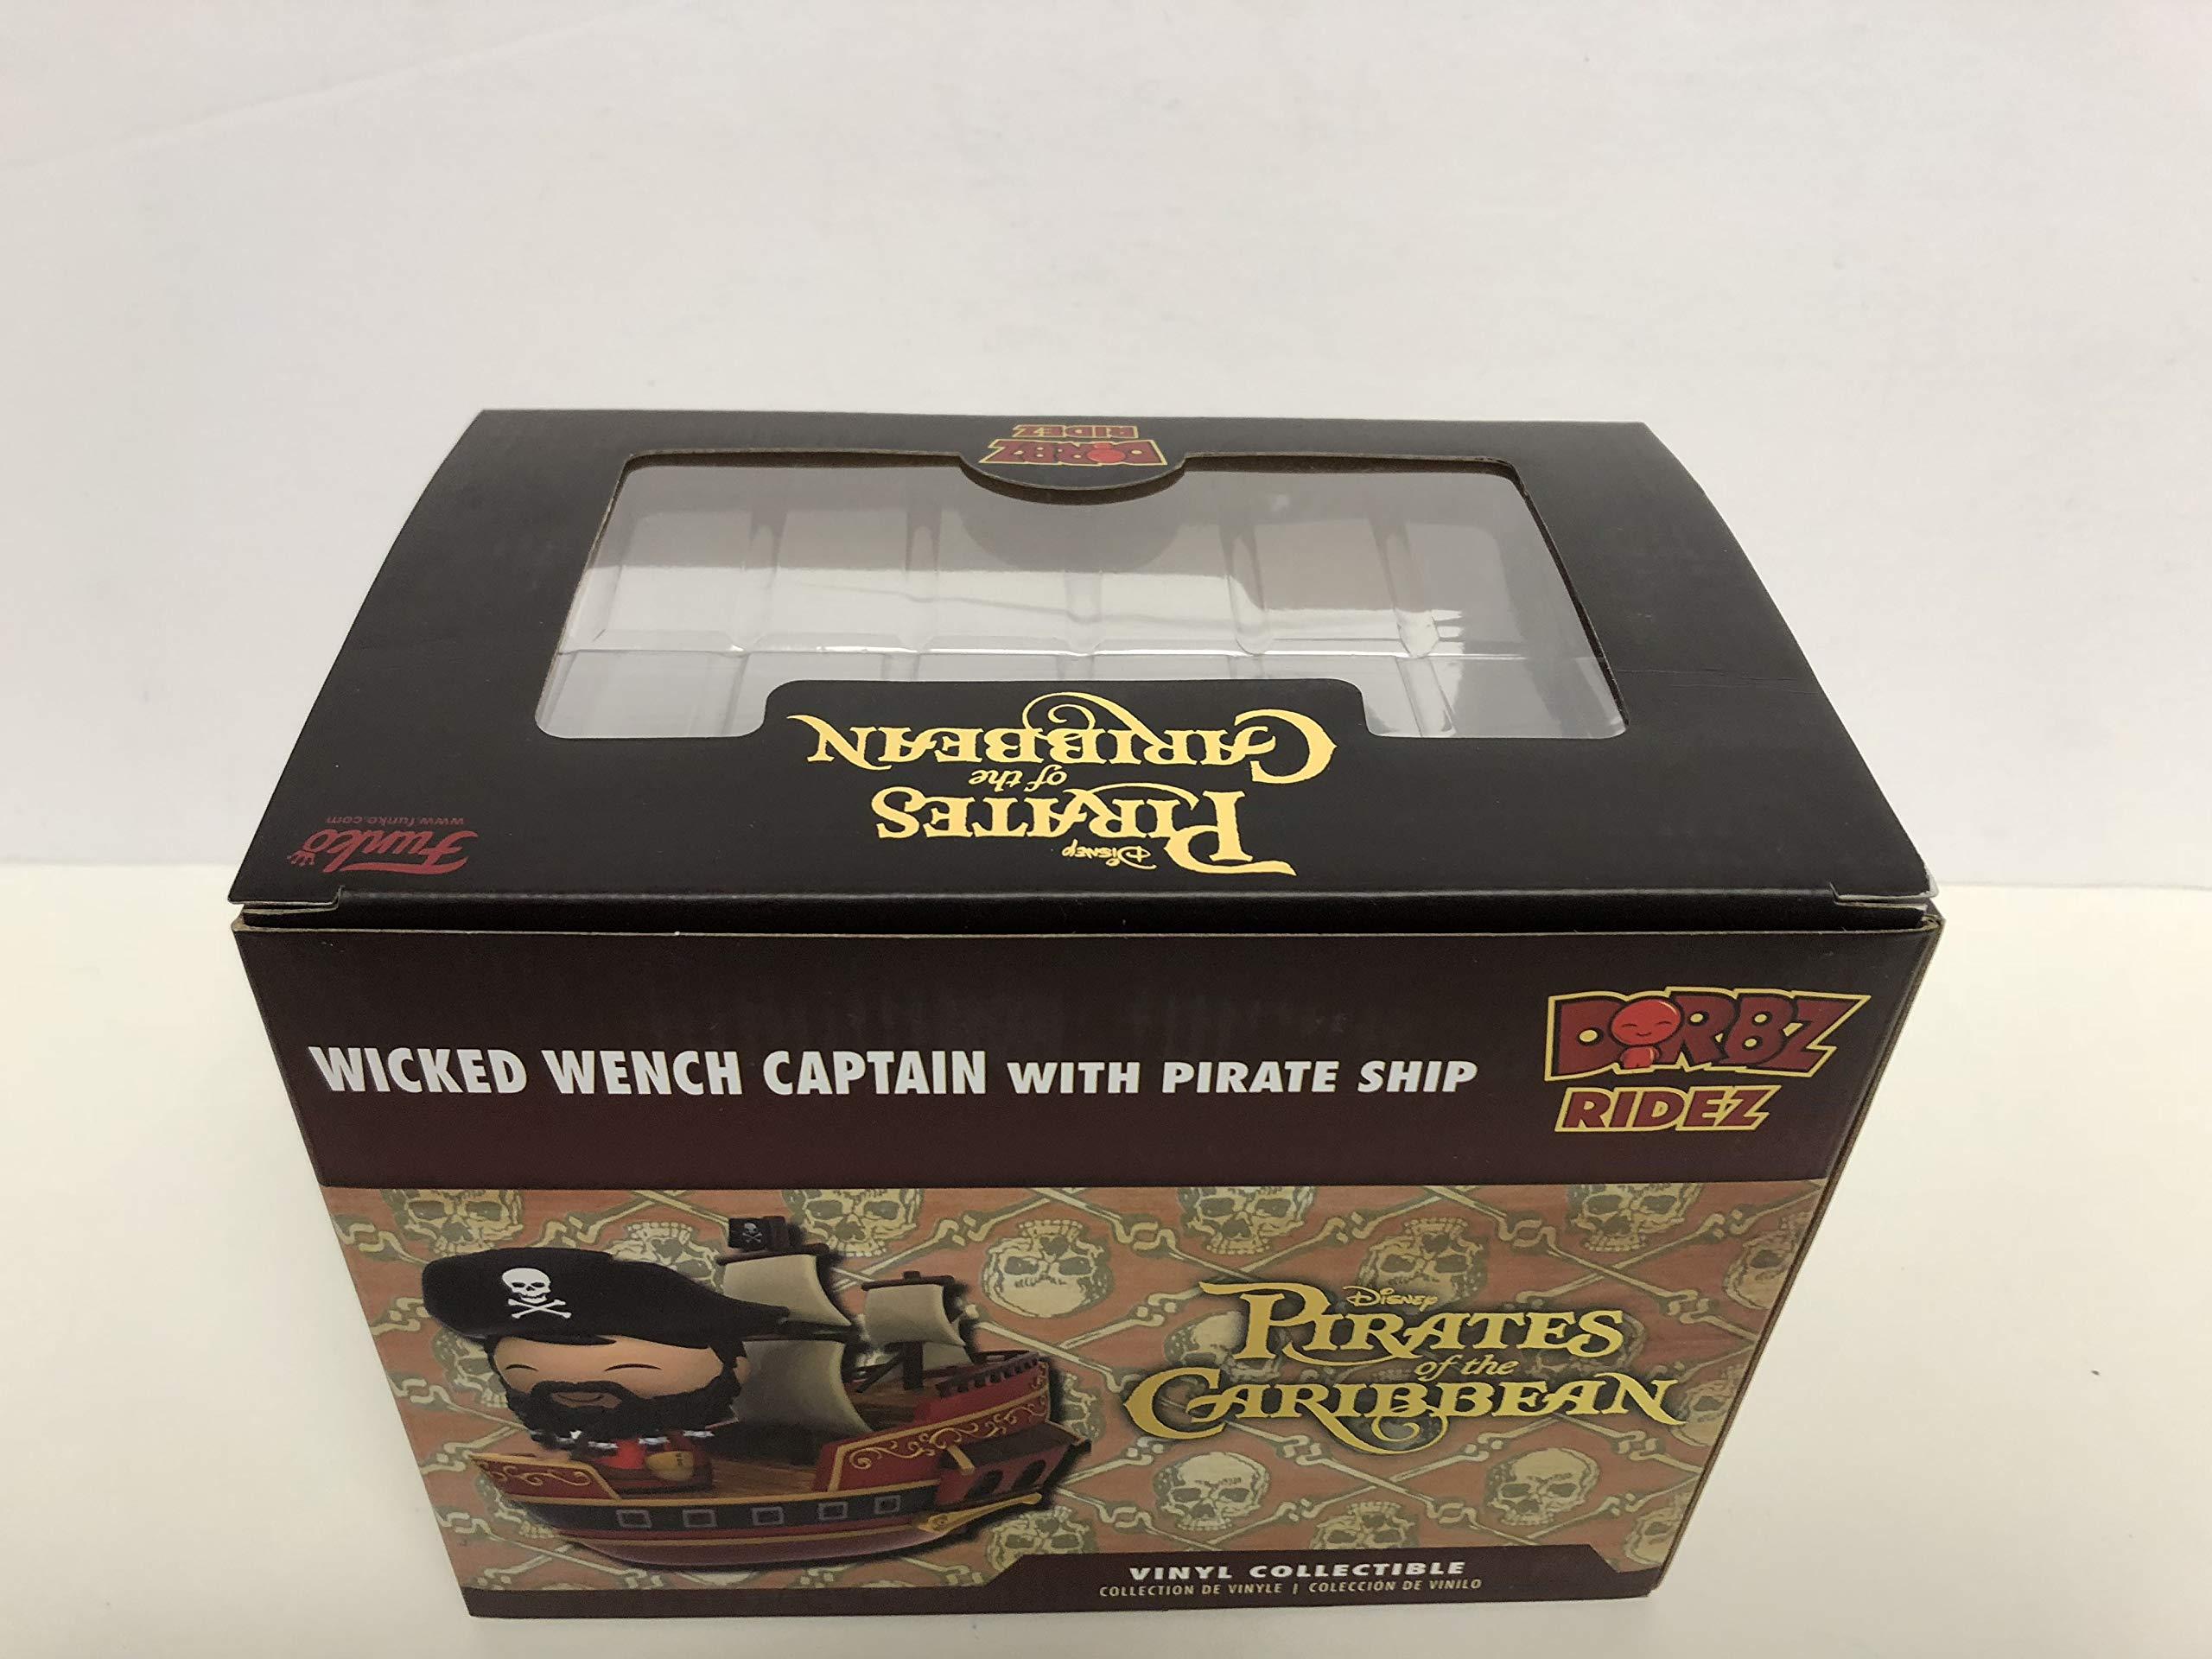 DORBZ RIDEZ Wicked Wench Captain with Pirate Ship vinyl collectible Funko Disney Treasures Exclusive